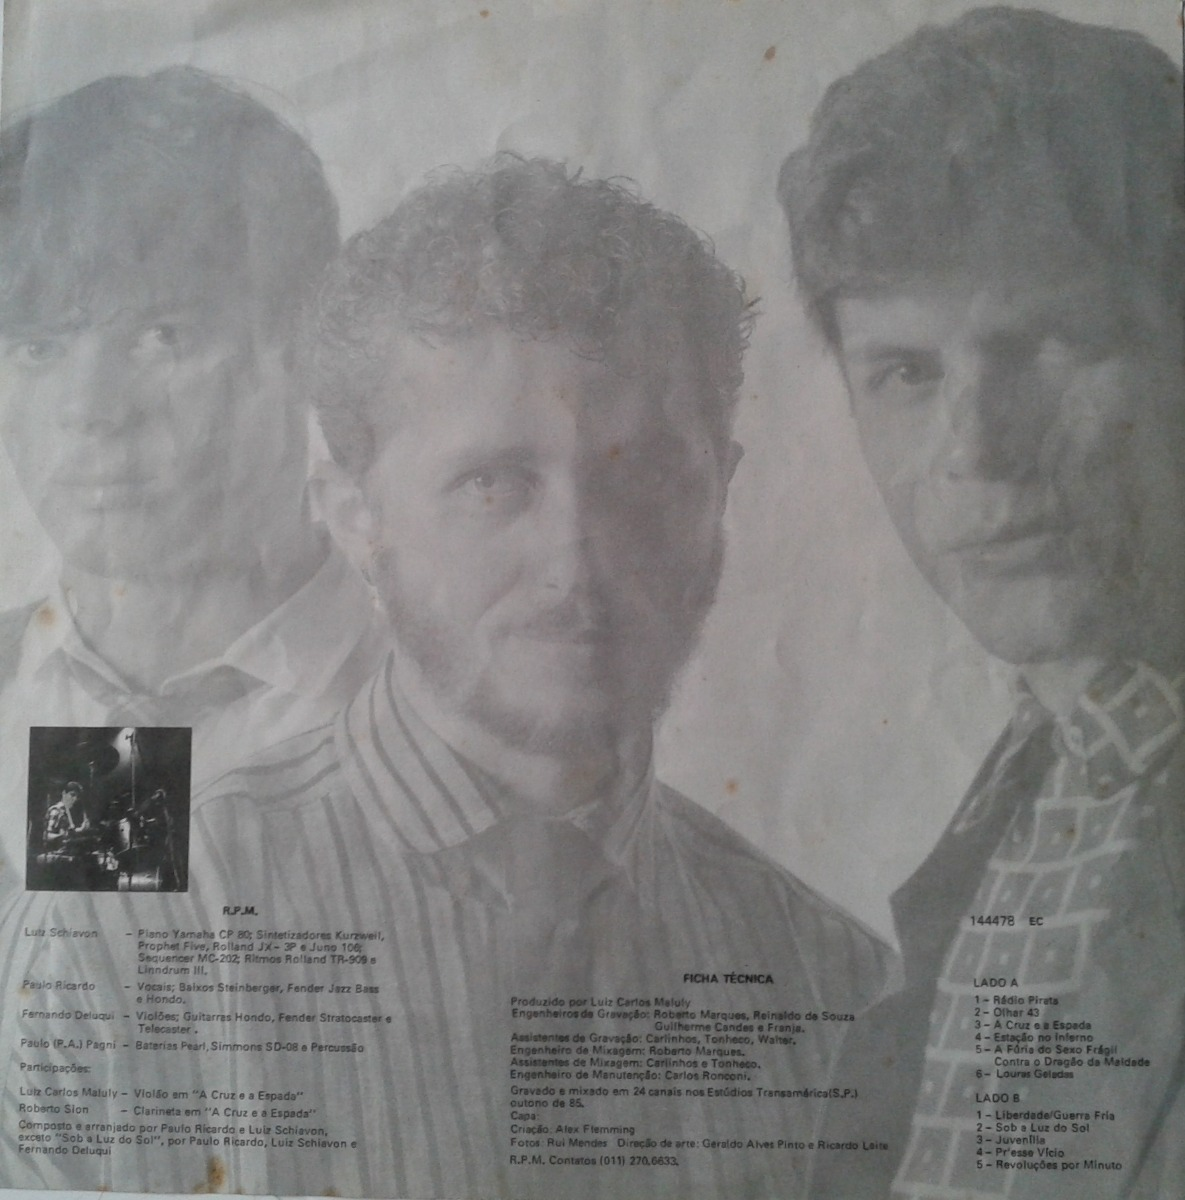 CD REVOLUCOES BAIXAR POR MINUTO RPM